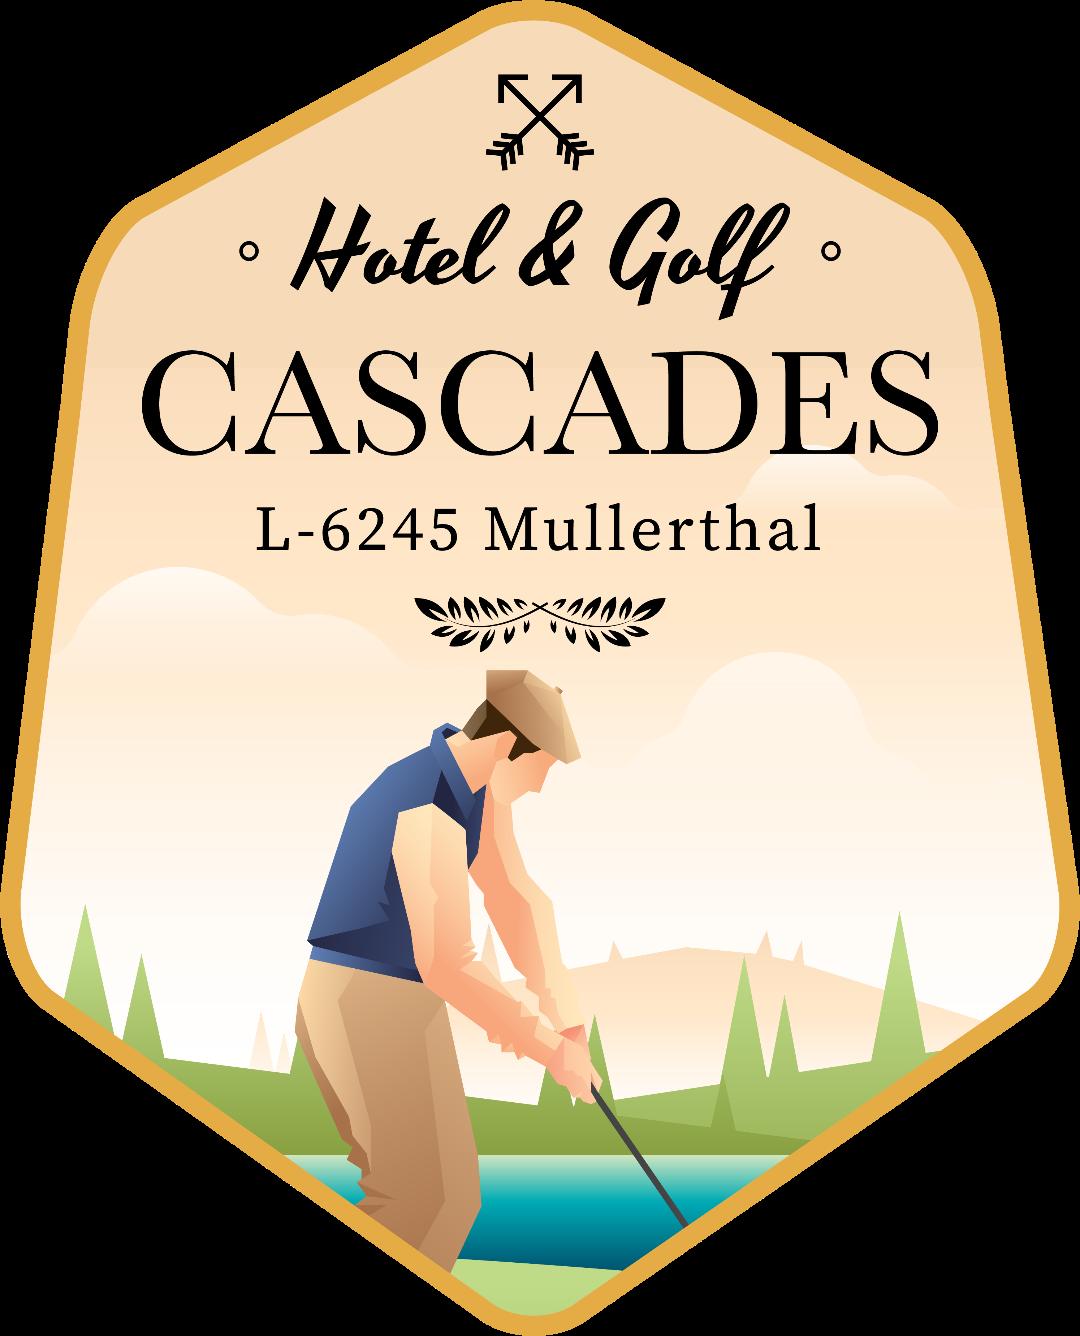 Hotel des Cascades Mullerthal